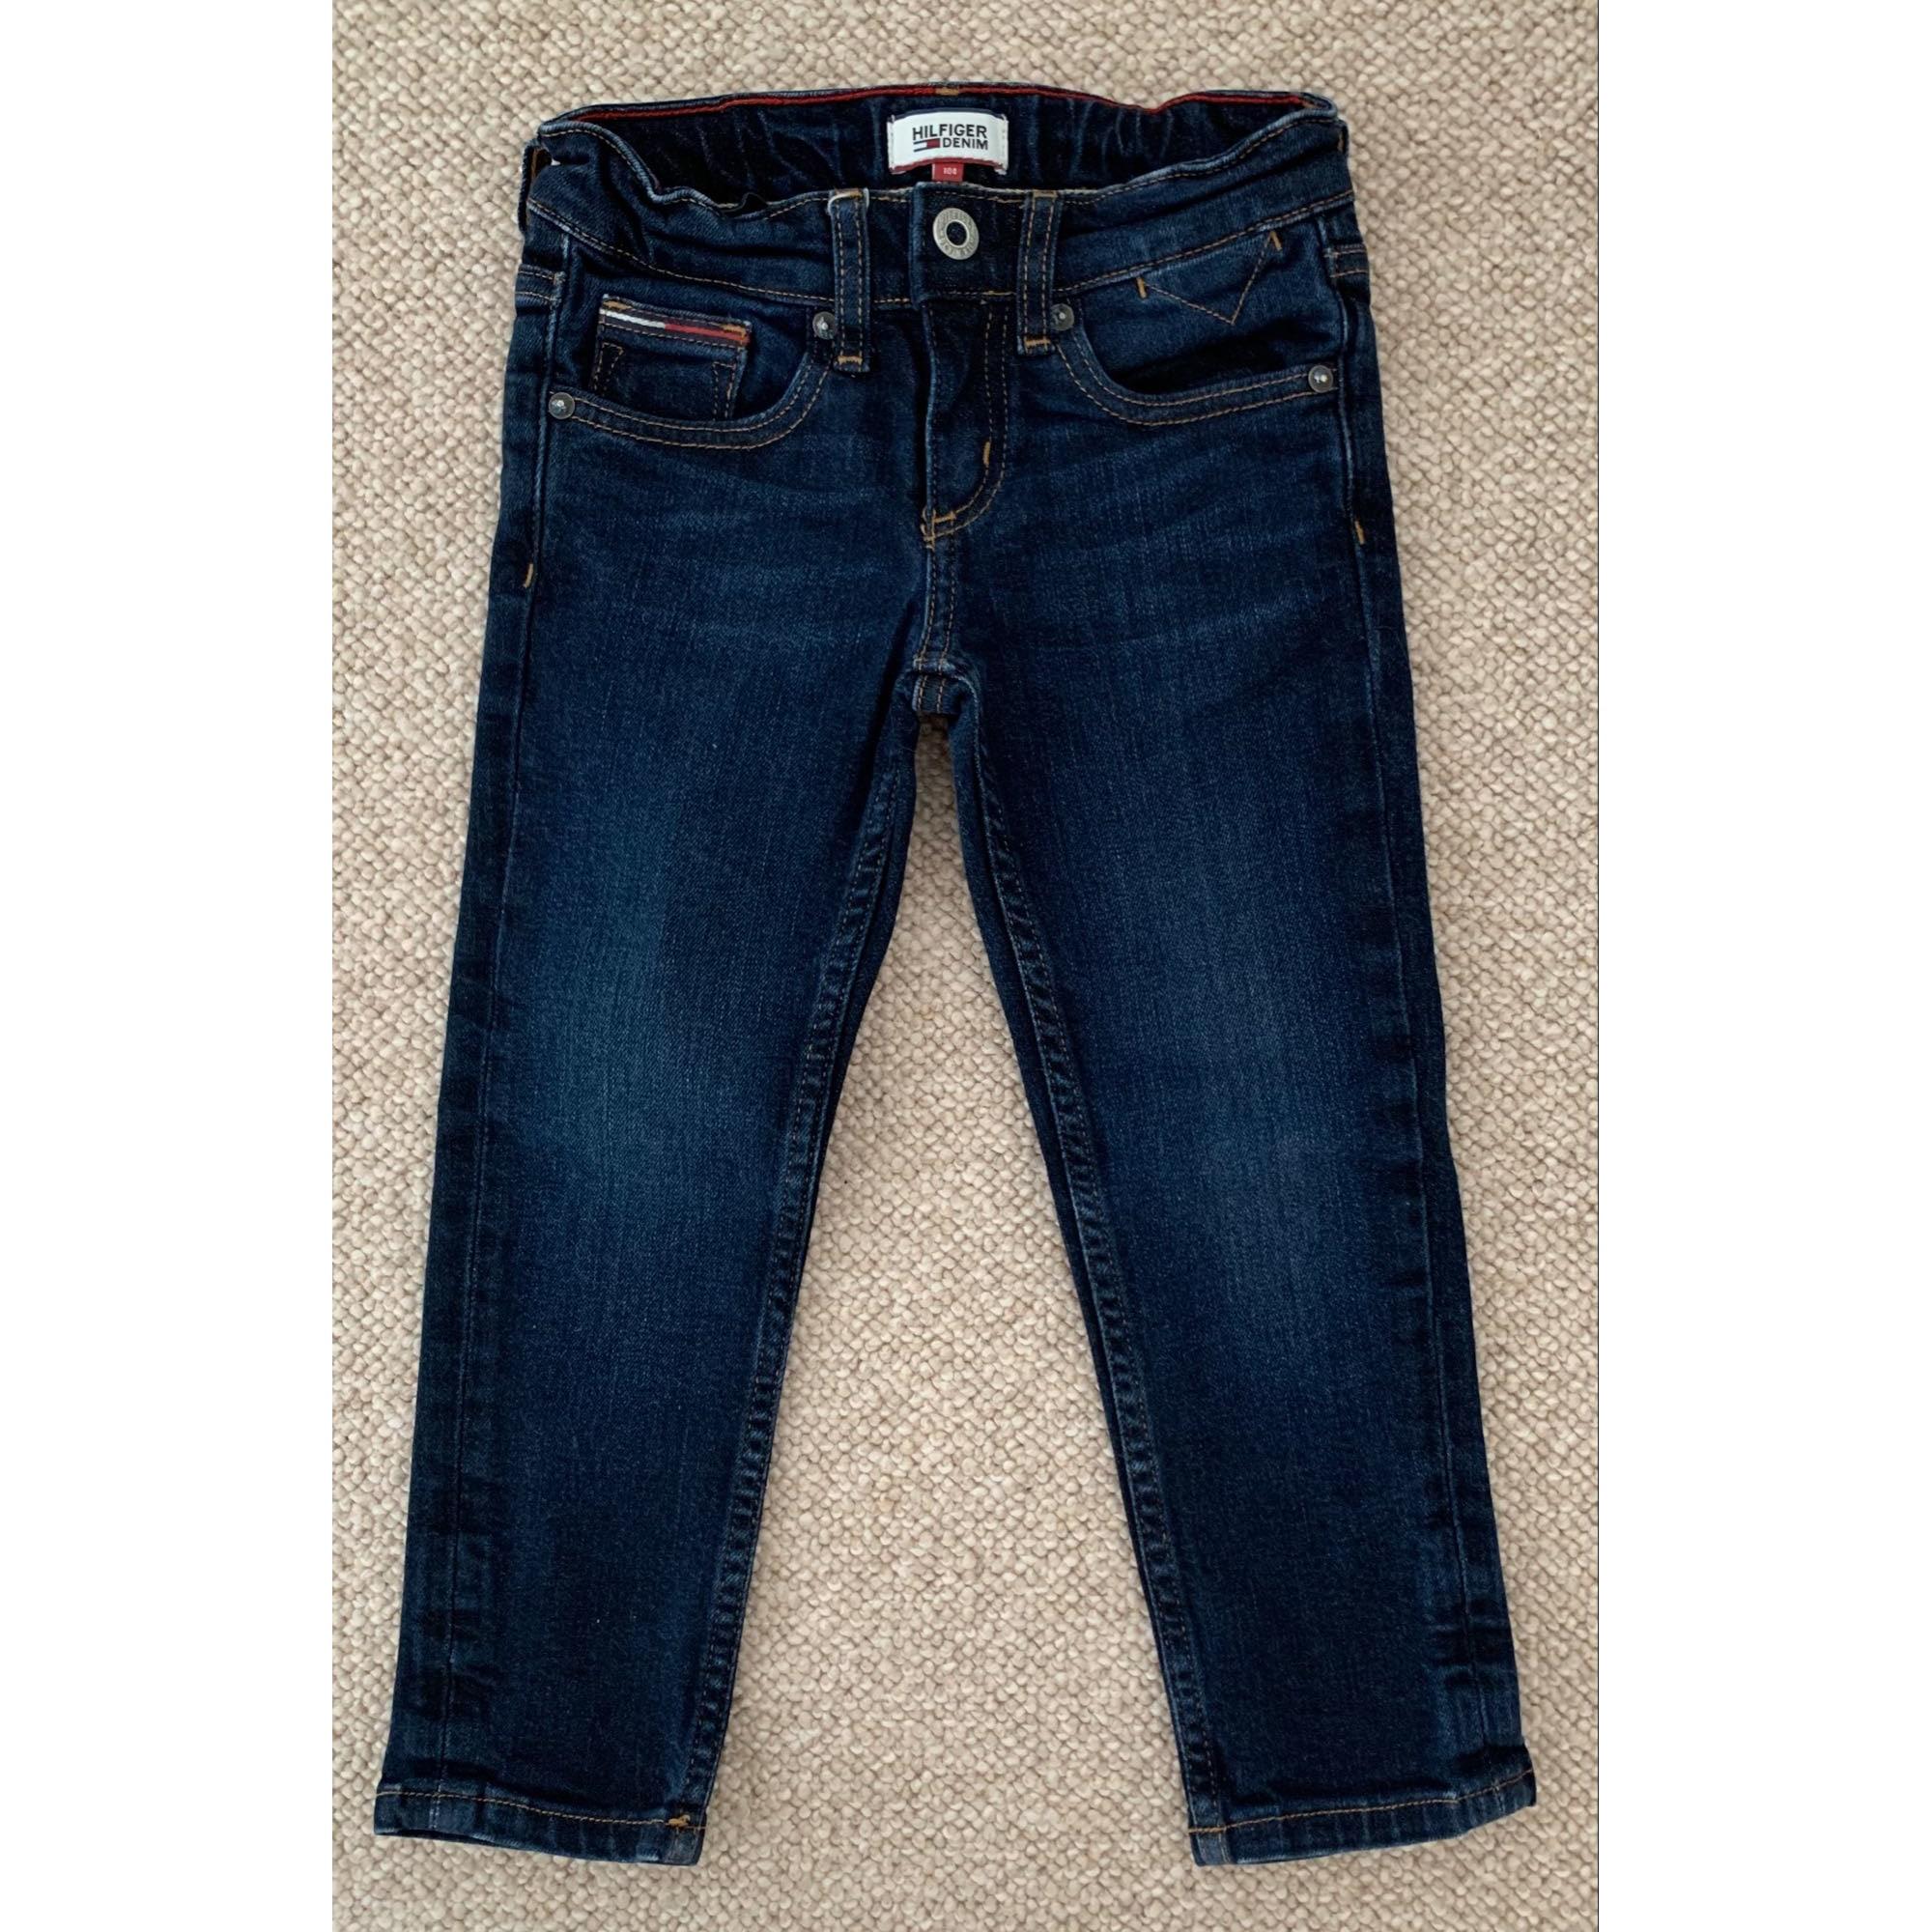 Jeans droit TOMMY HILFIGER Bleu, bleu marine, bleu turquoise